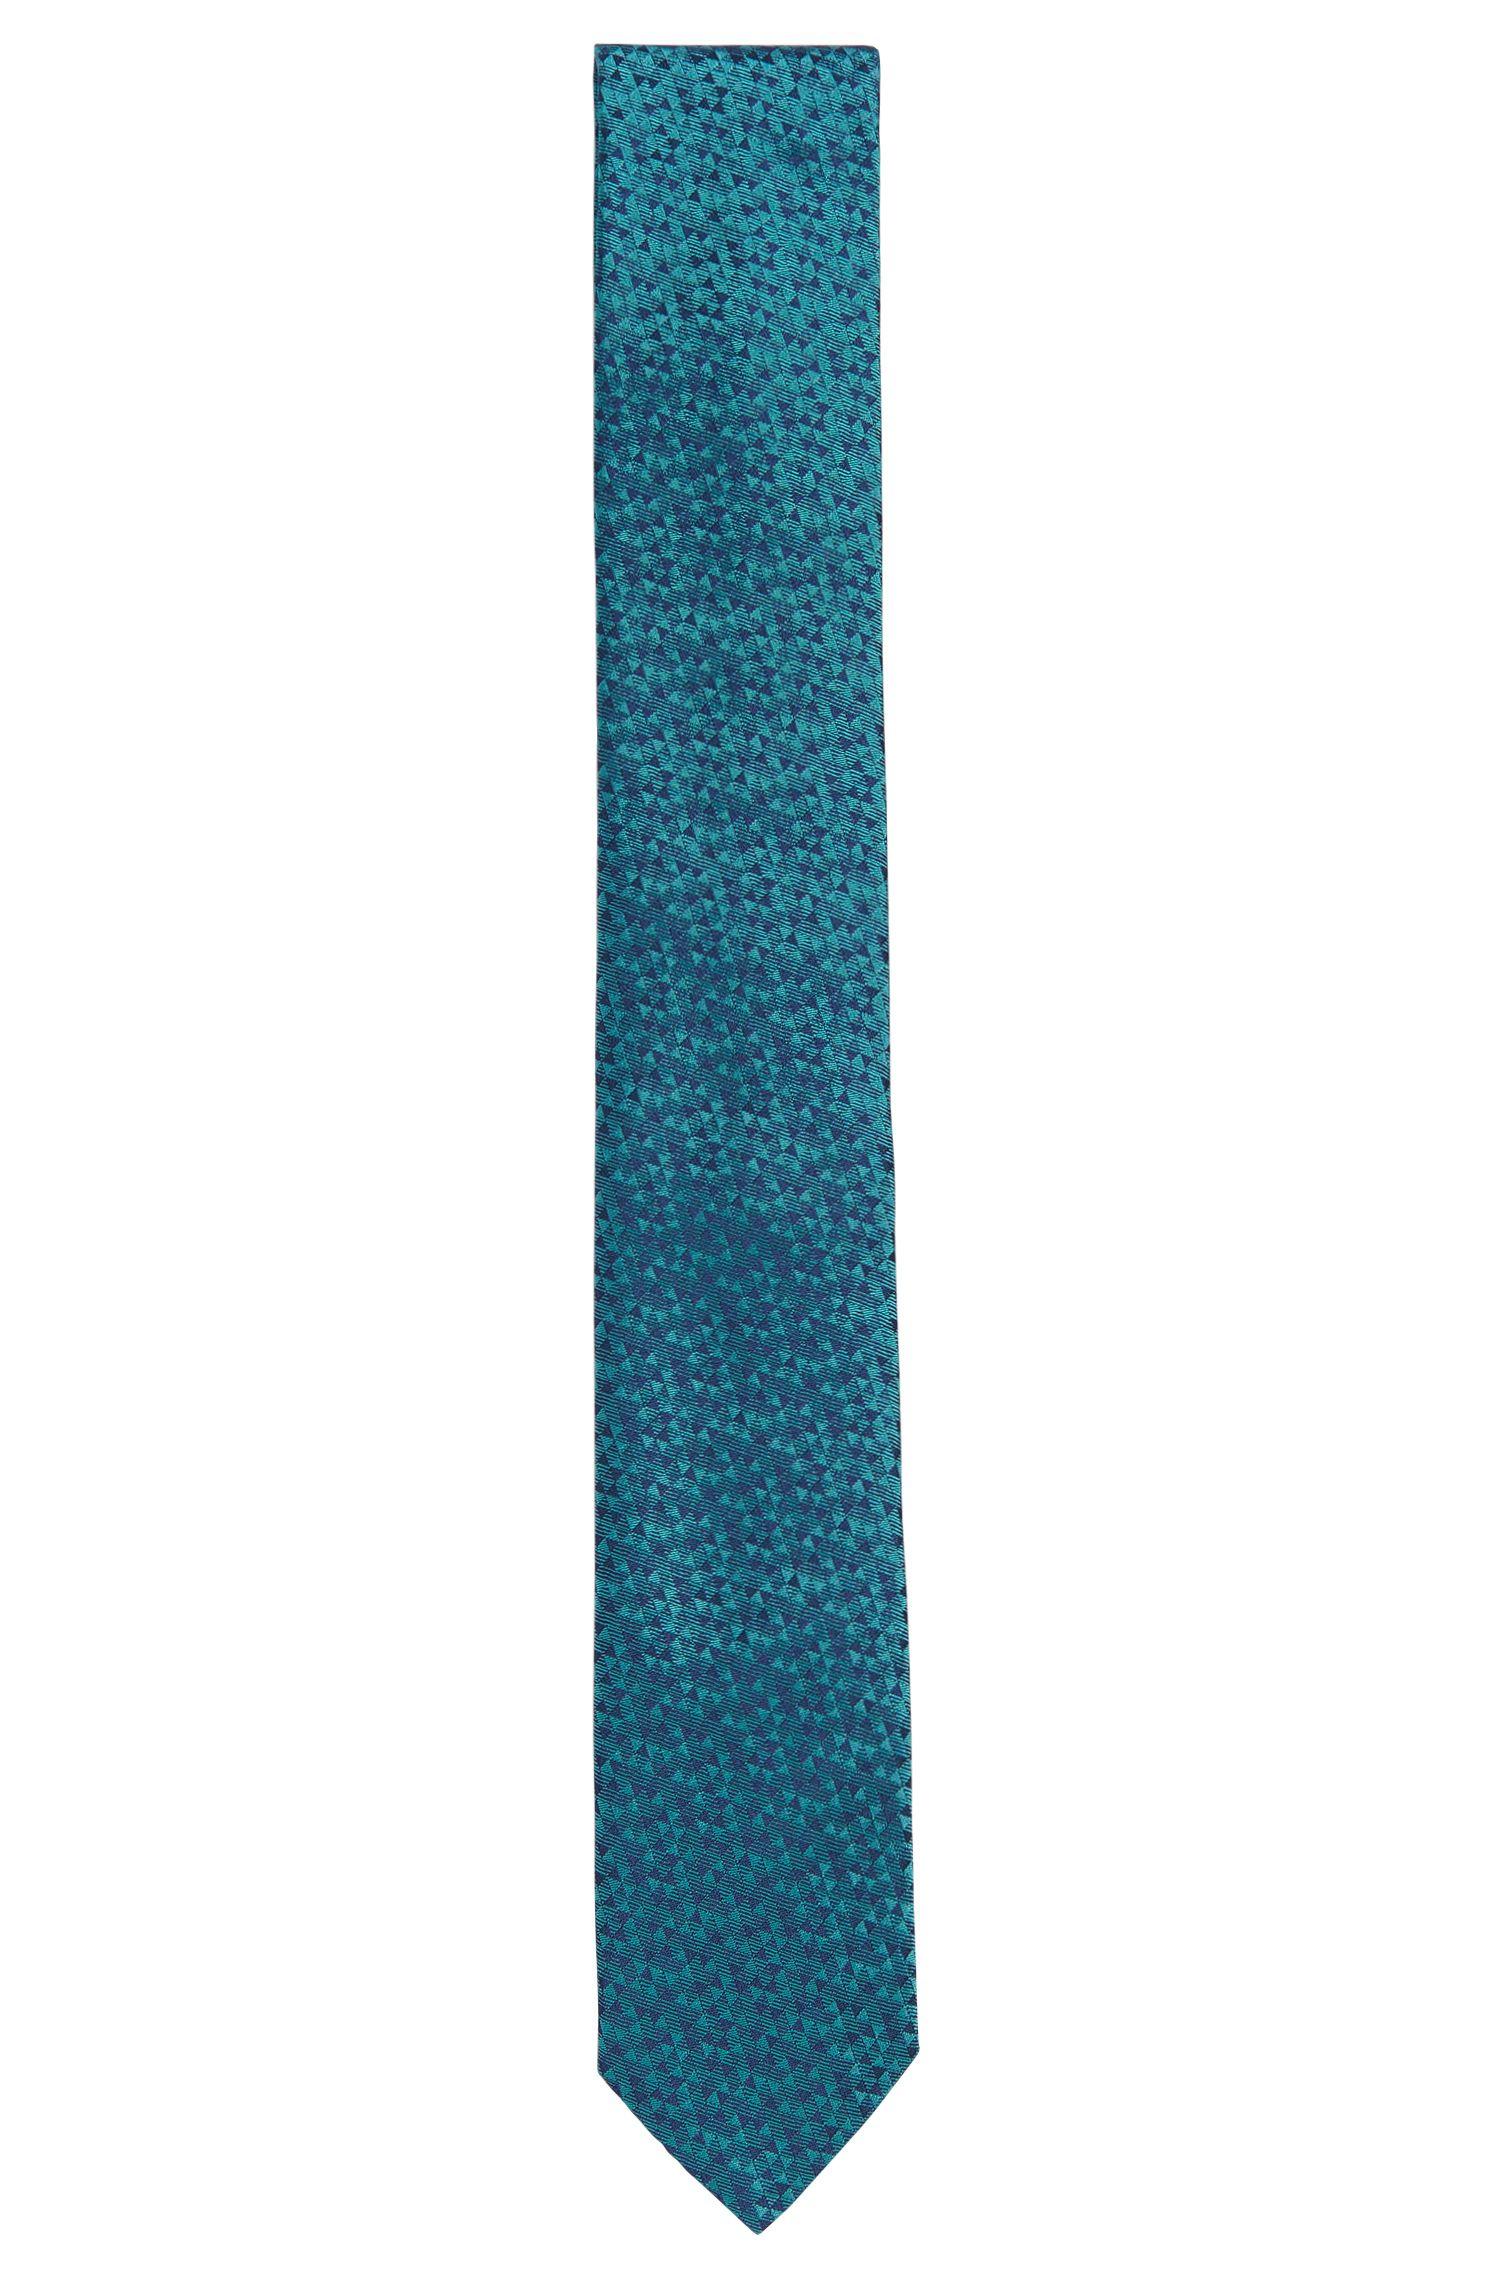 Corbata con fino estampado en seda: 'Tie 6cm'